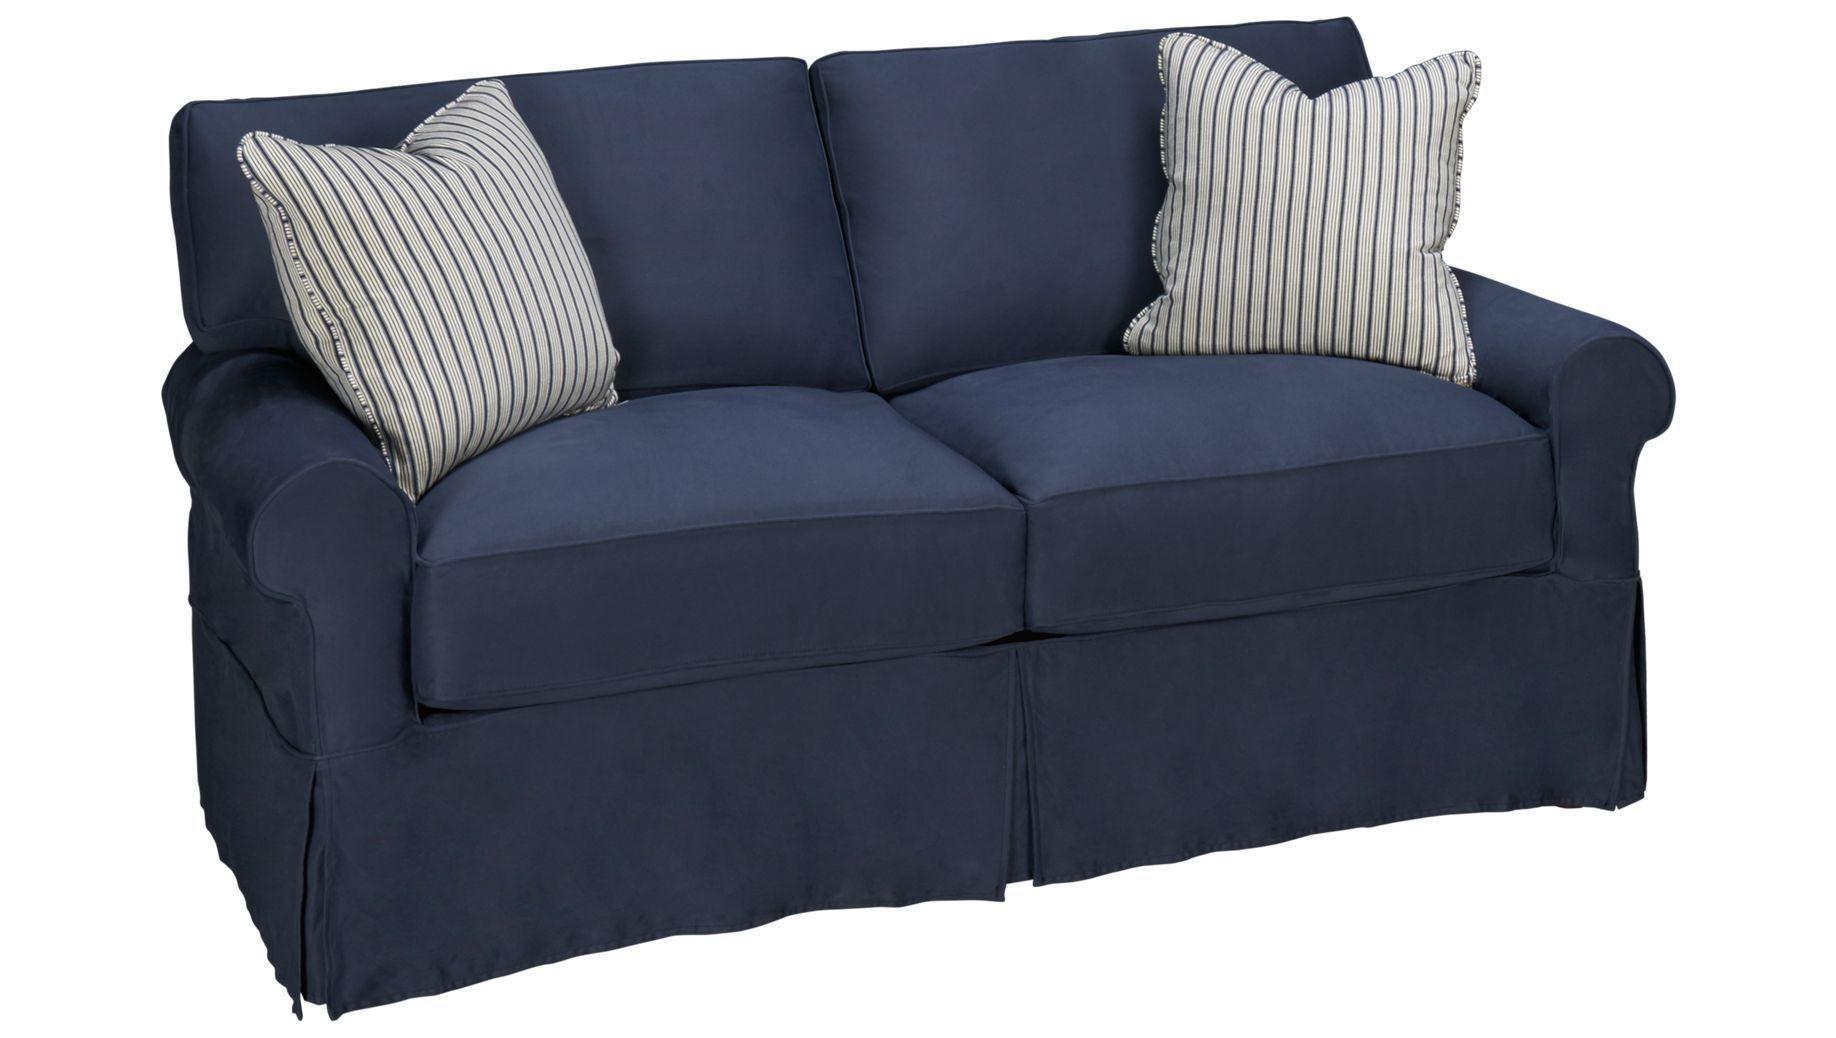 Nantucket 2 seat slipcover queen sleeper sofa rowe furniture rowe - Furniture Rowe Nantucket Nantucket Full Sleeper